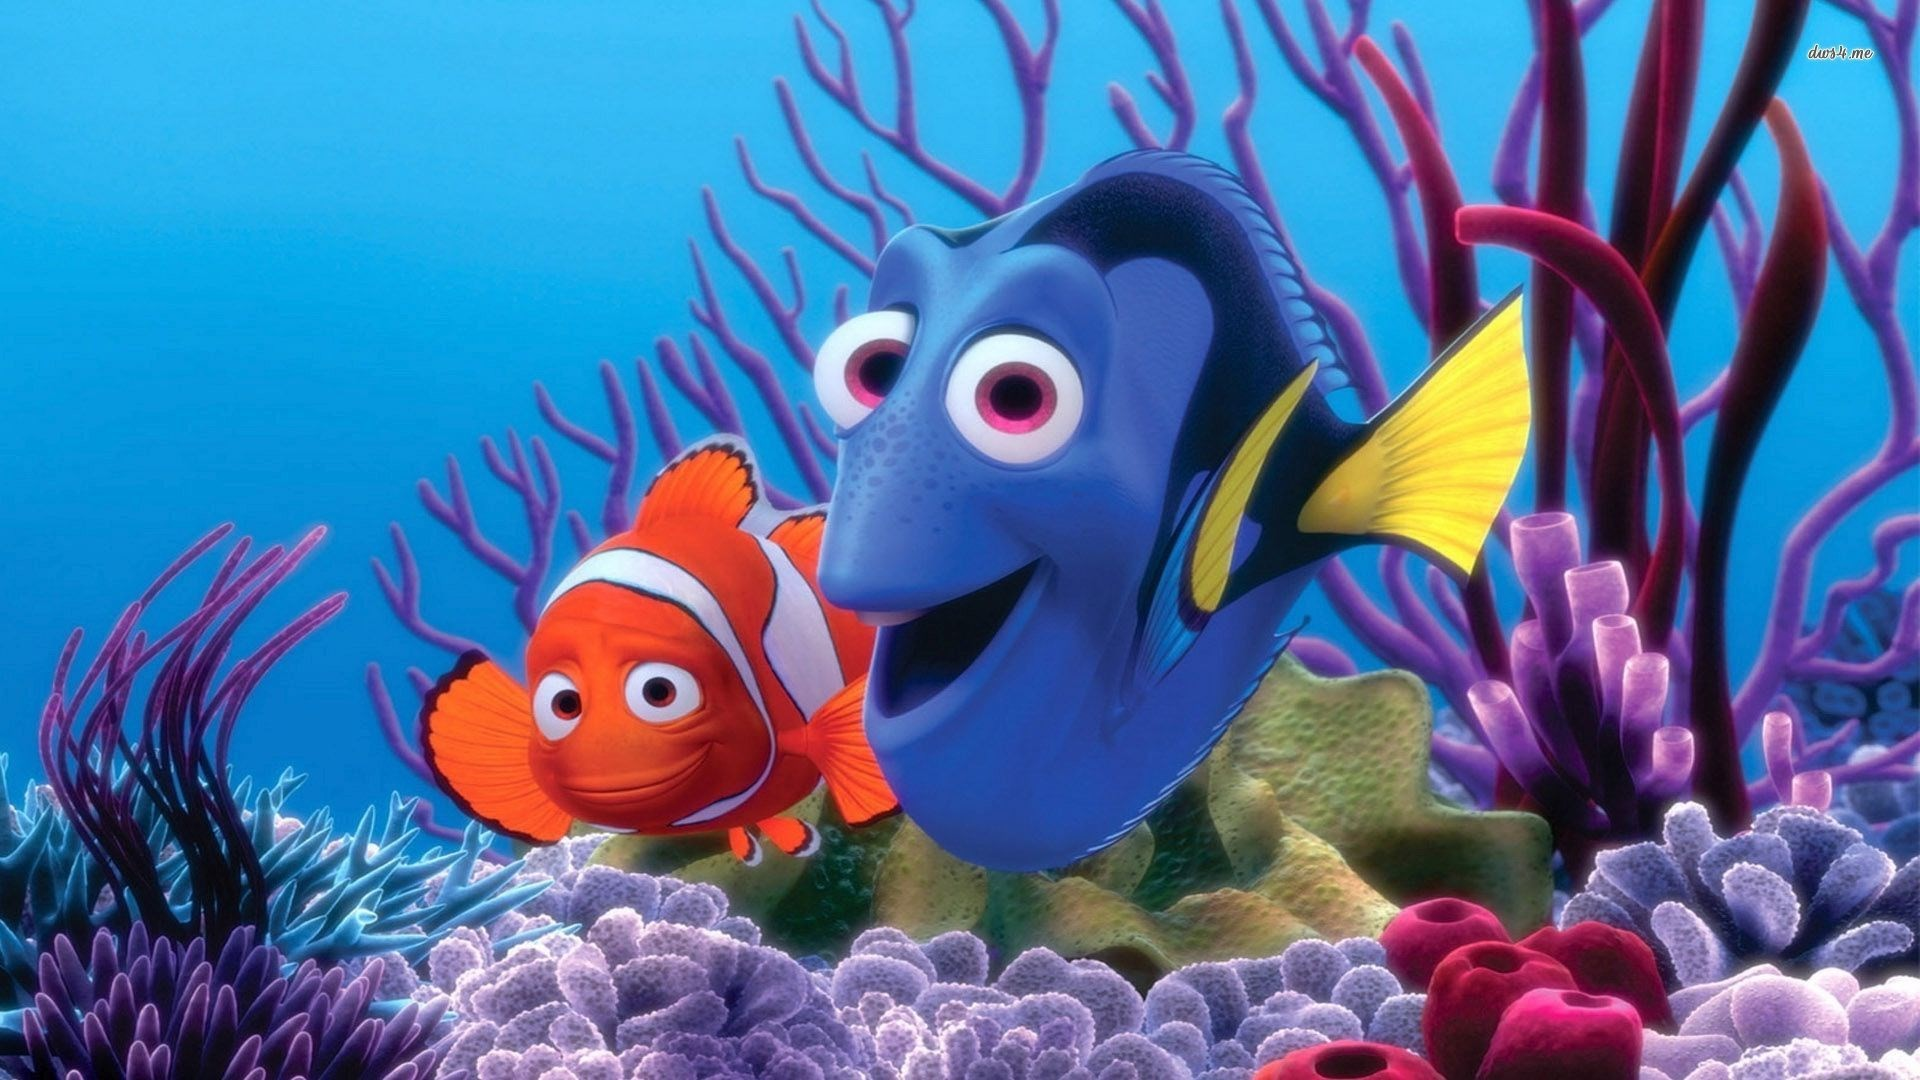 1920x1080 Aquarium Backgrounds EBay Download Finding Nemo